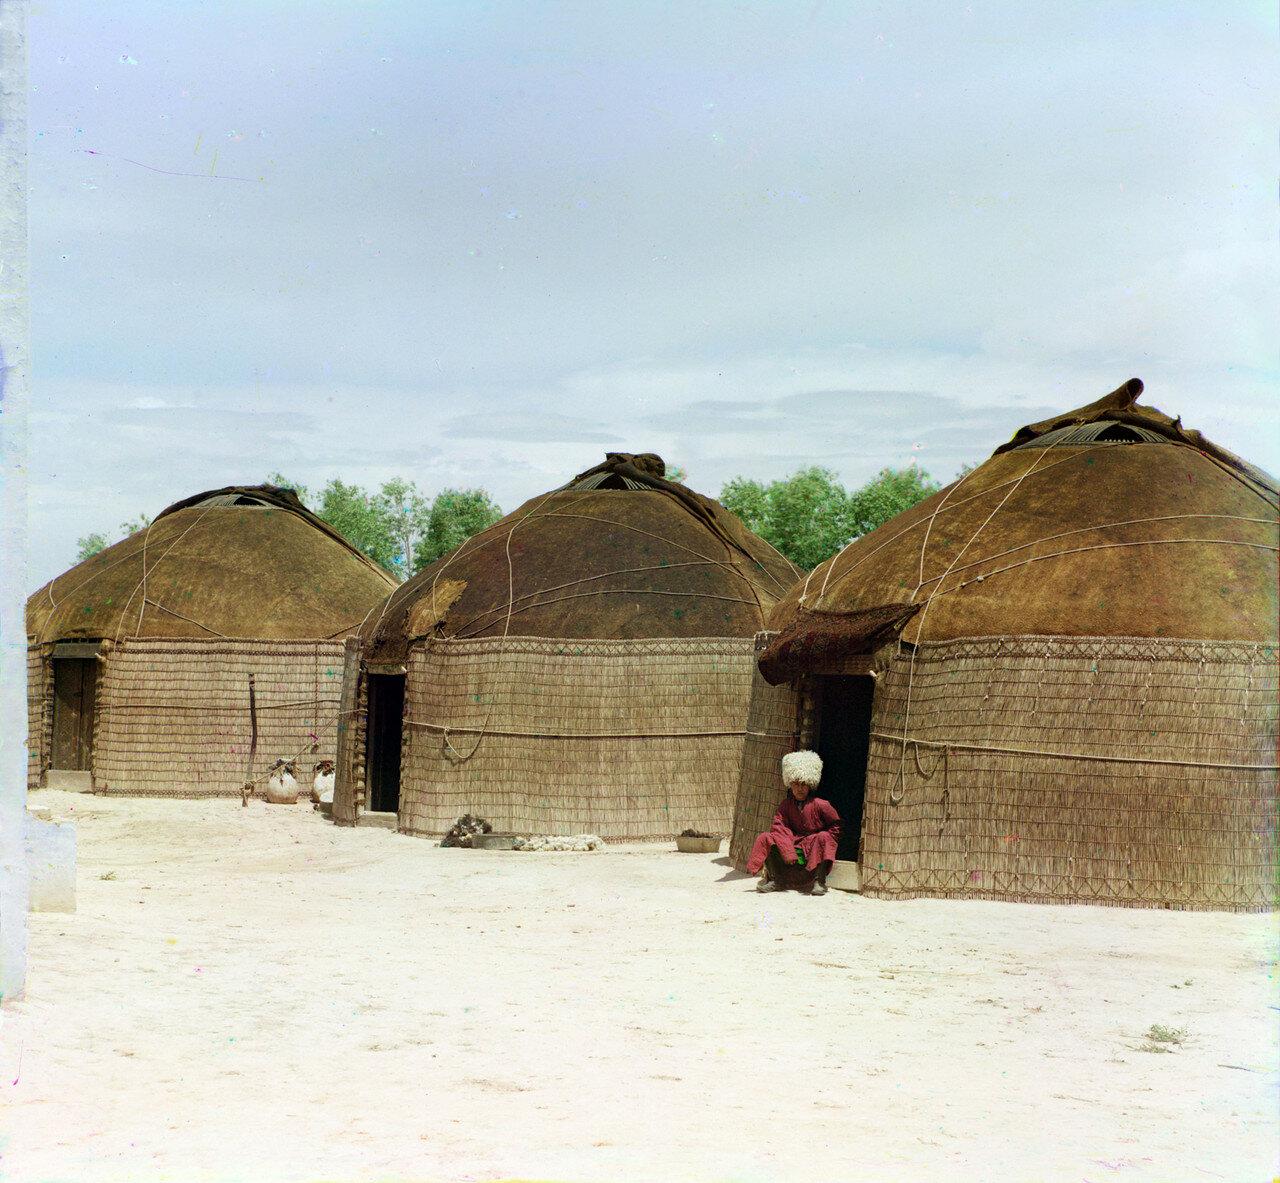 Окрестности Мерва. Близ Байрам-Али. Текинские кибитки